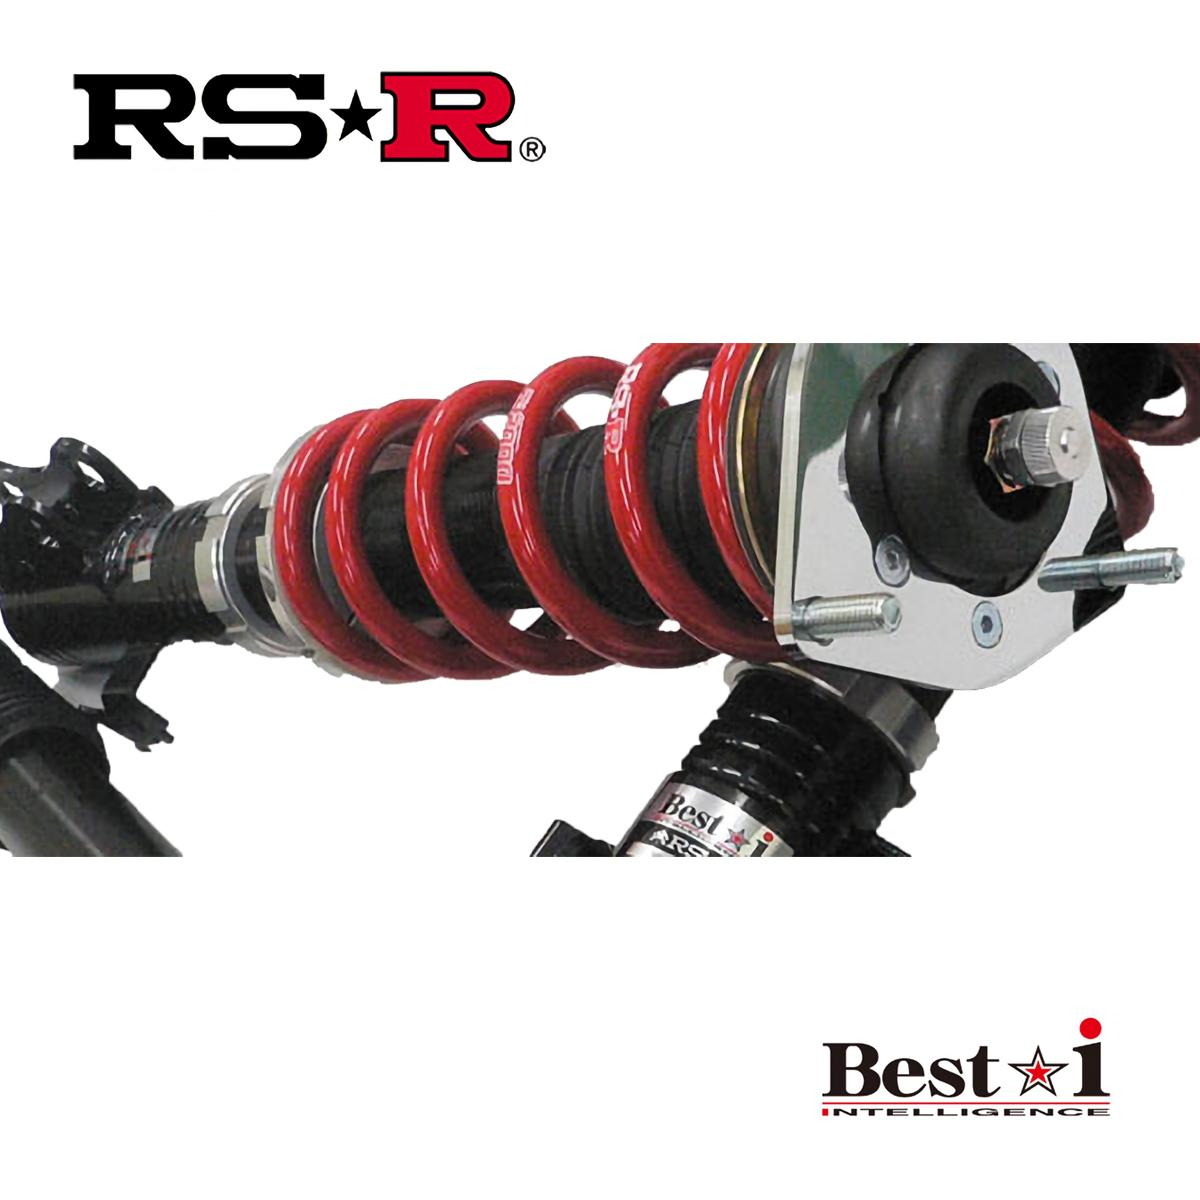 RS-R セレナ NC26 車高調 エンジン型式:MR20DD BIN706M ベストi RSR 条件付き送料無料